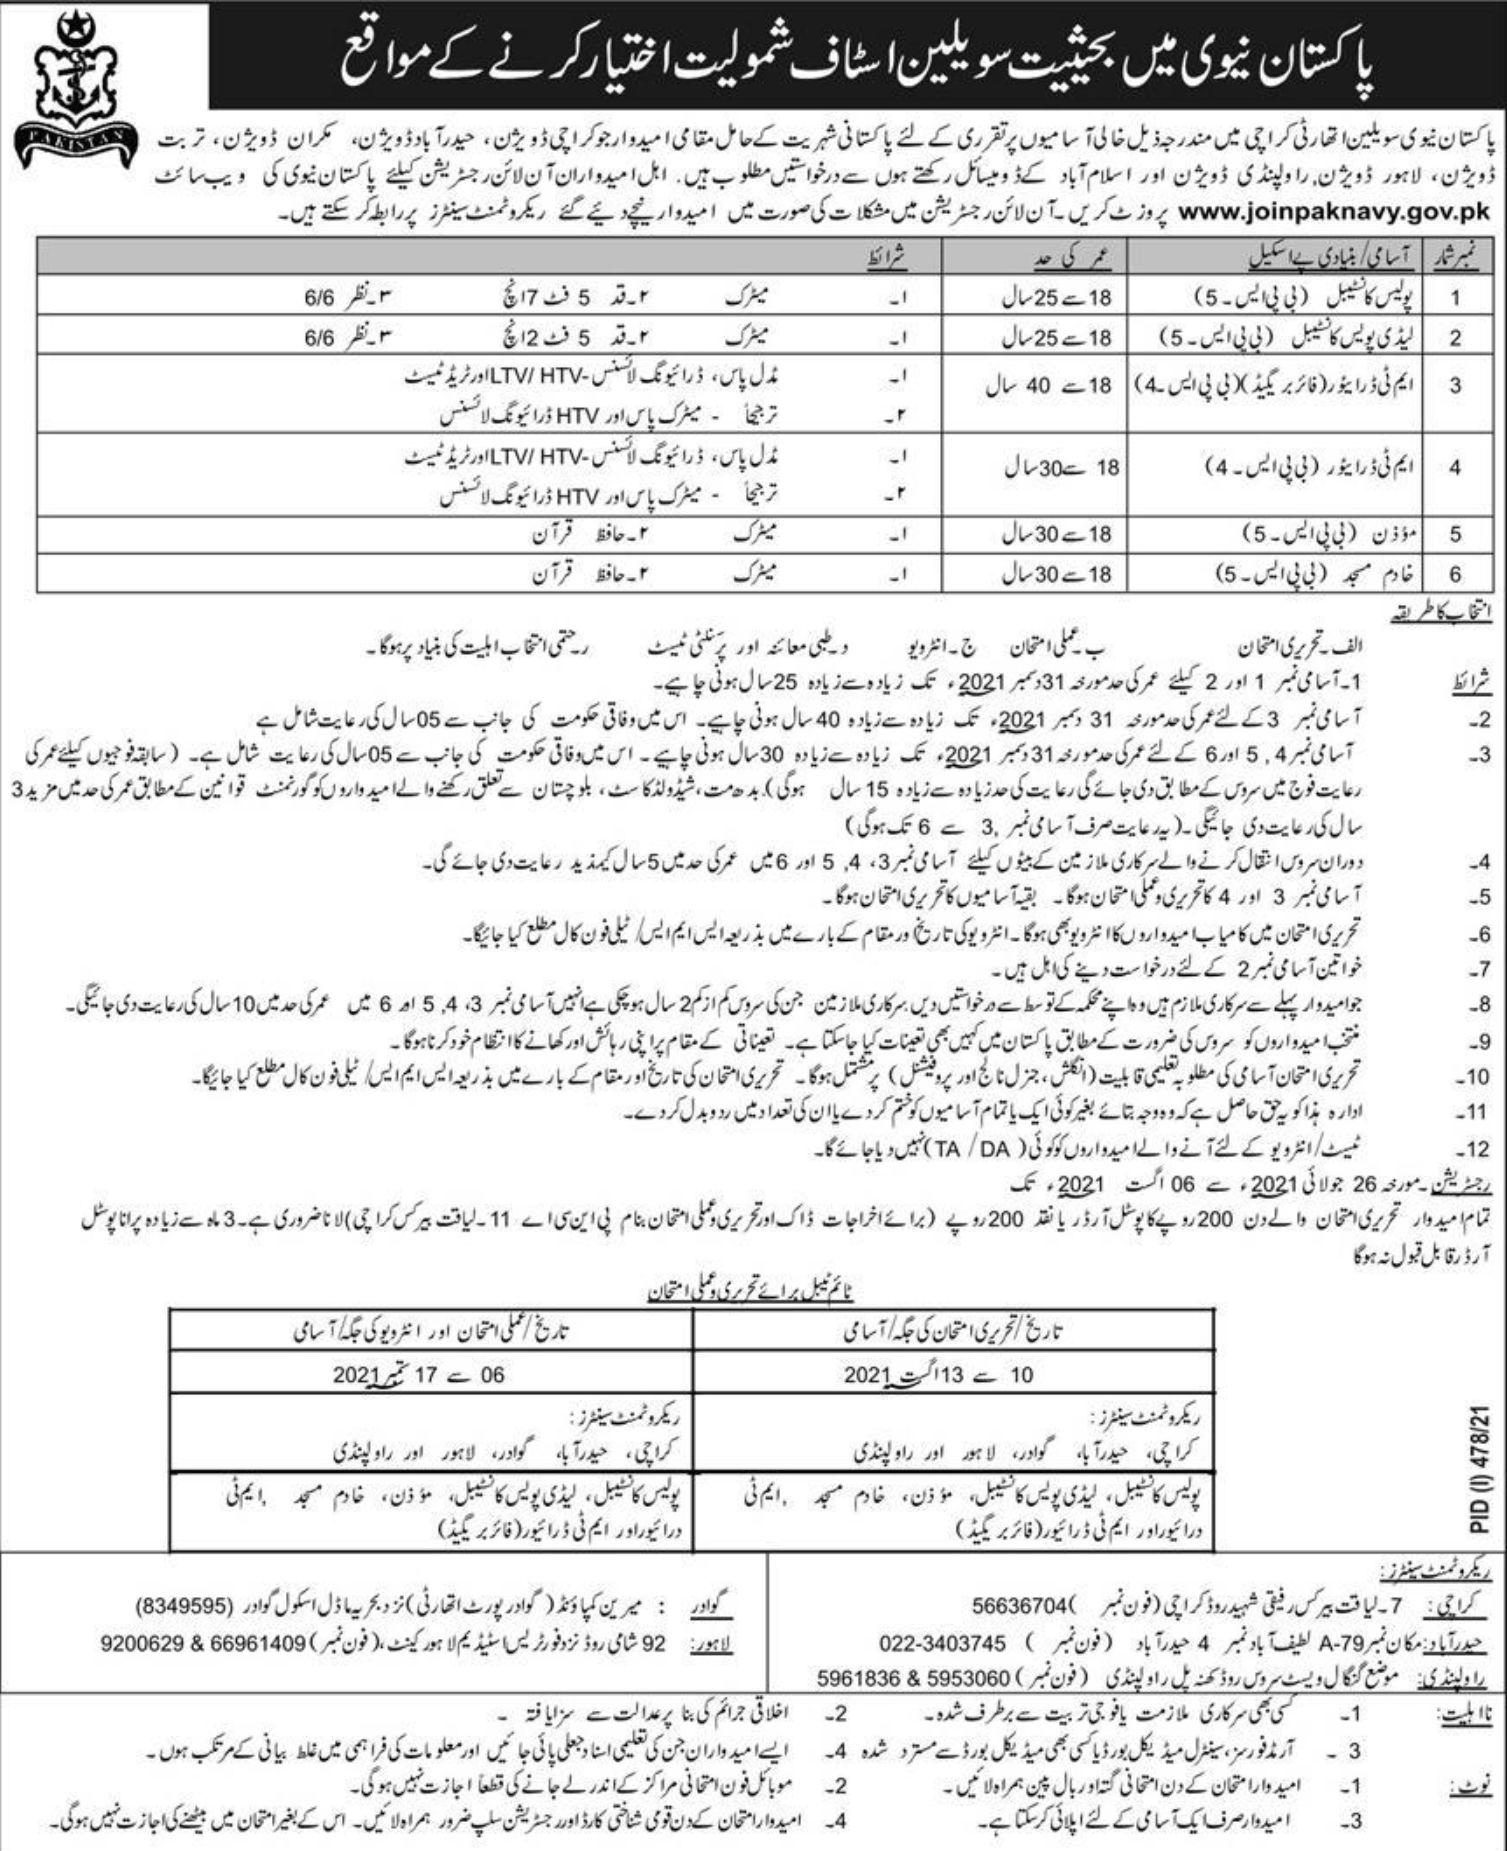 Pakistan Navy Jobs 2021 Police Constables